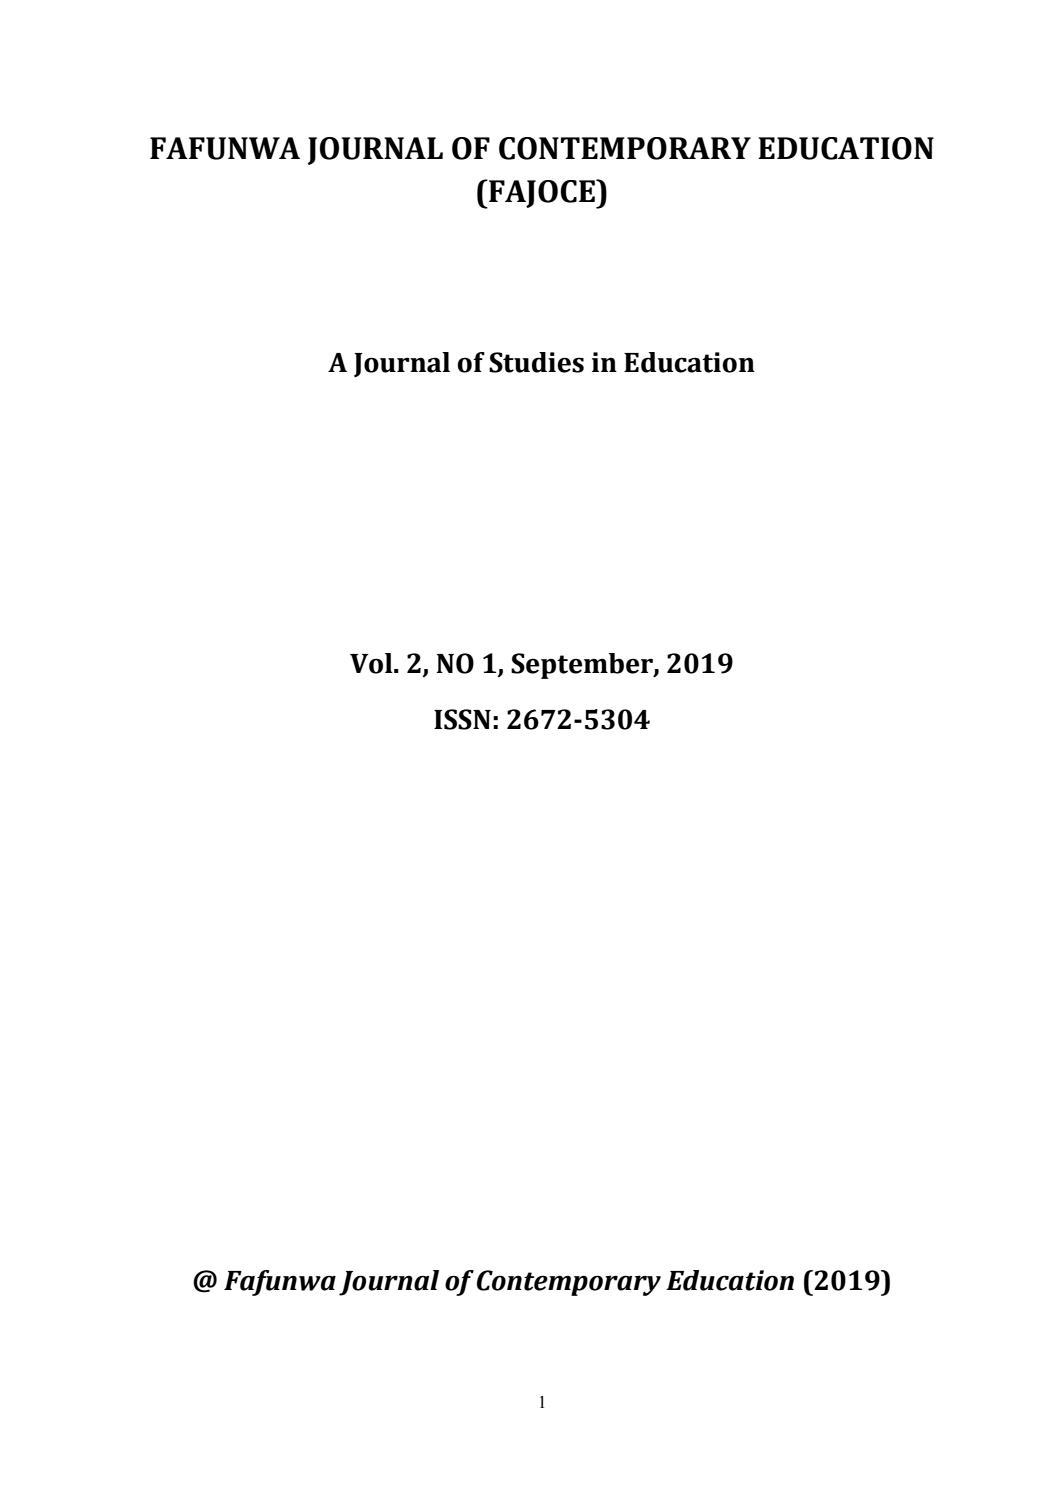 Fafunwa Journal Of Contemporary Education Fajoce By Cloudspheretech Issuu